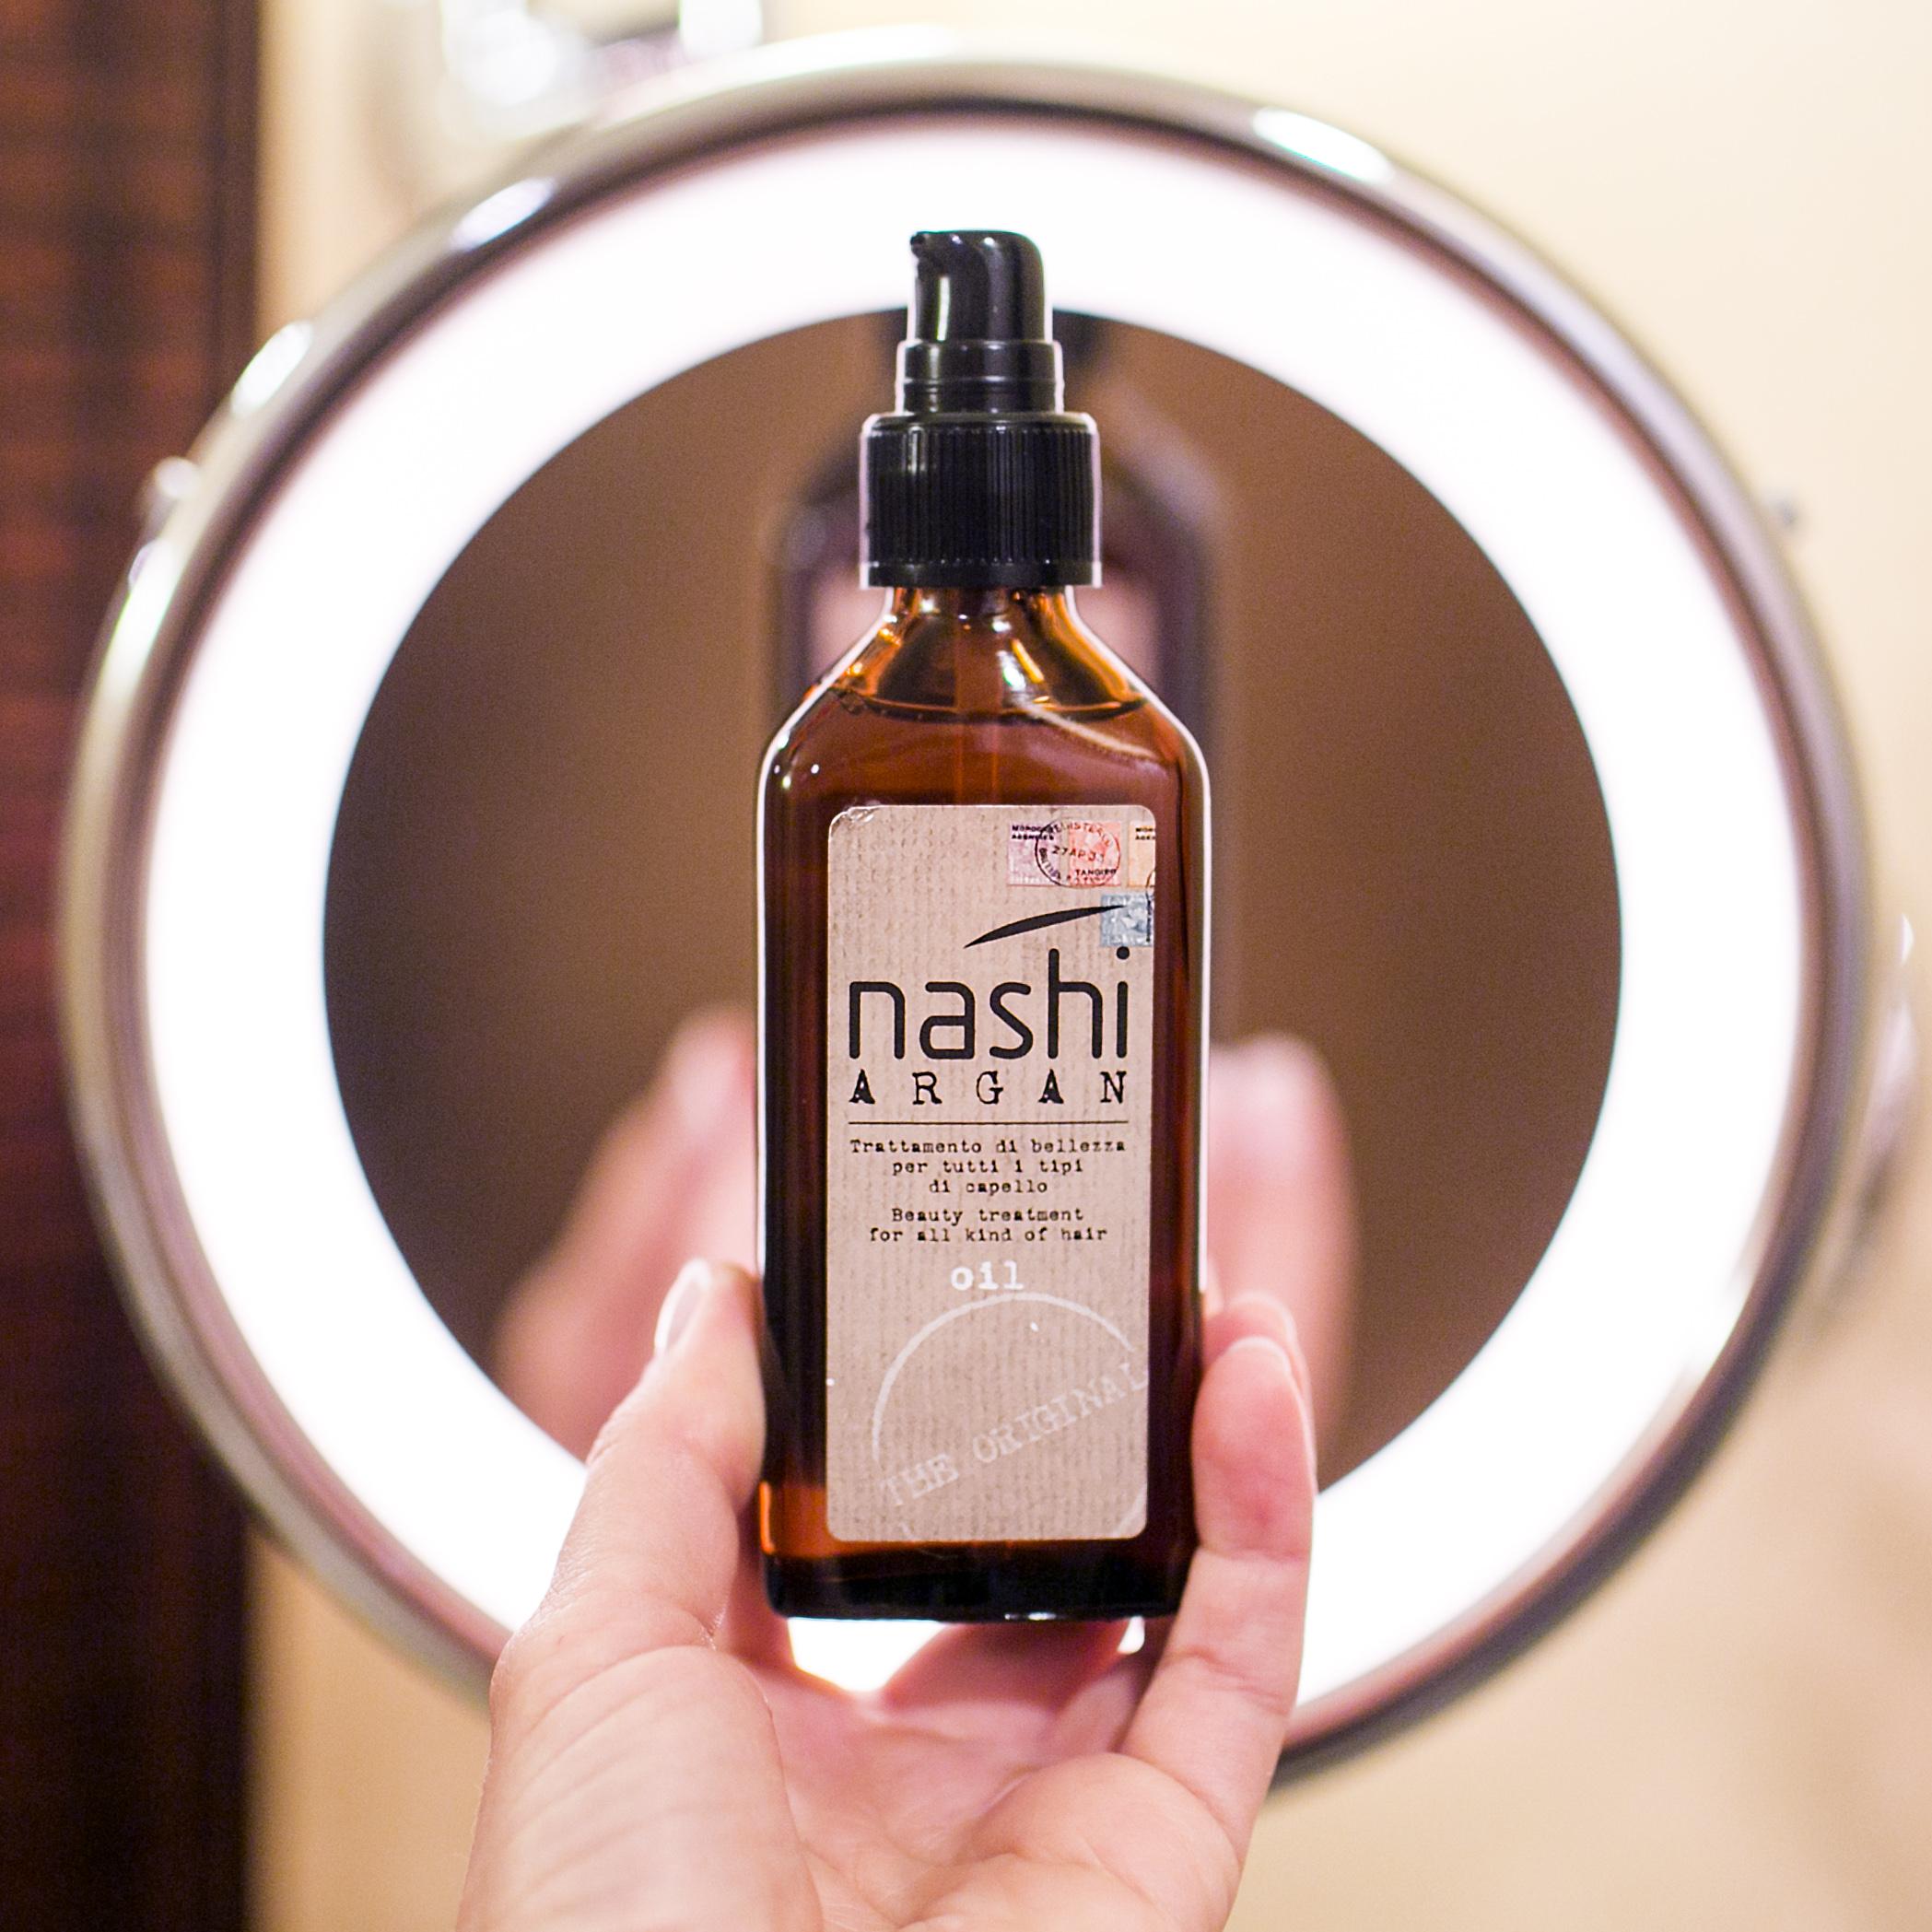 NASHI THE WOMAN